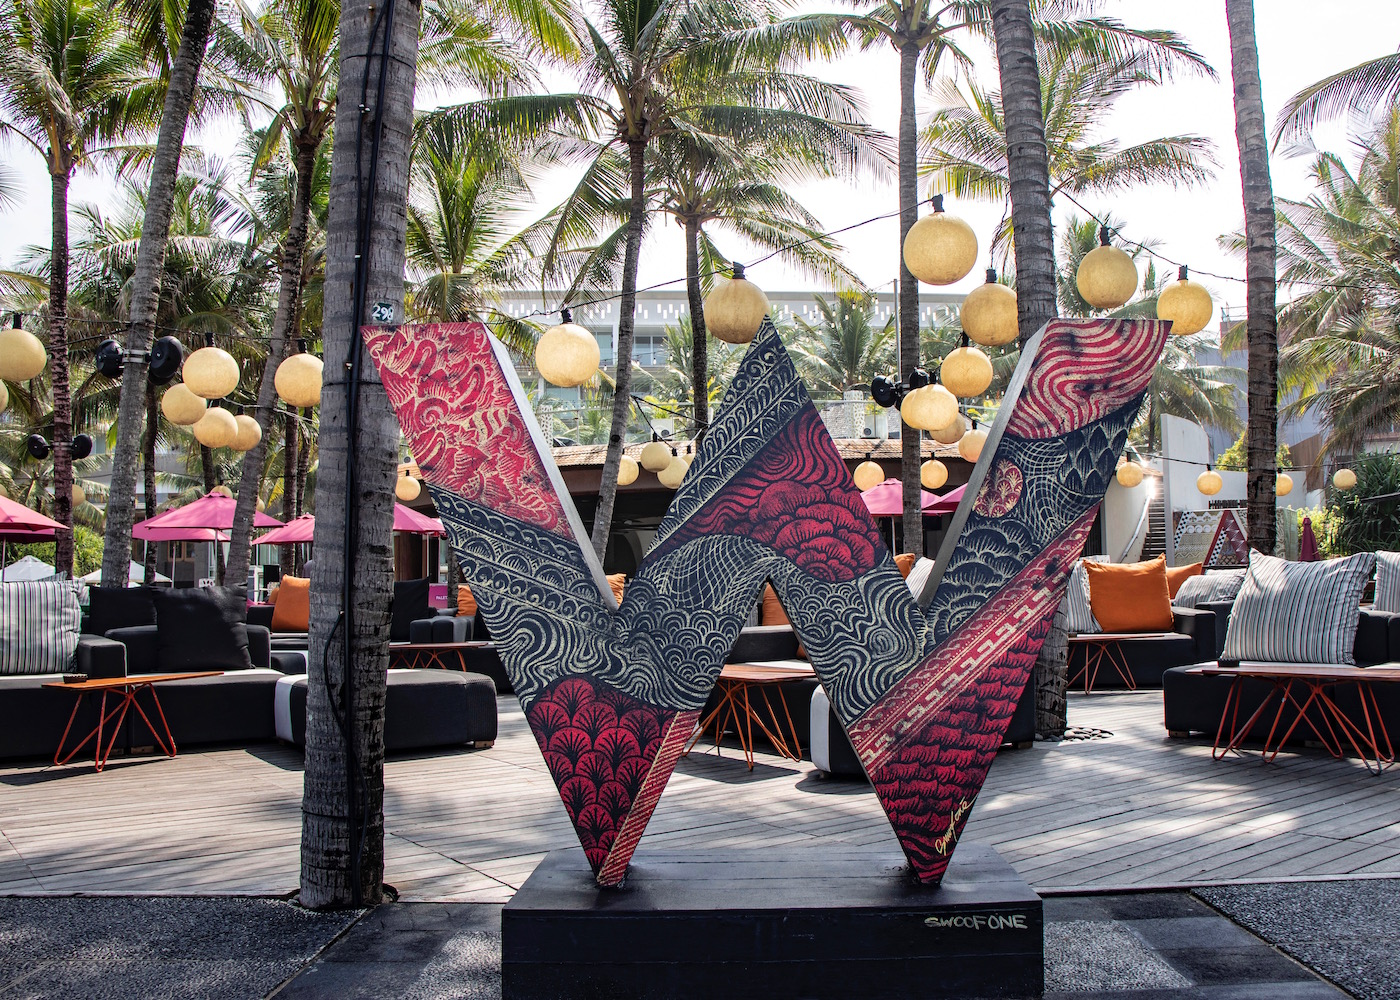 W Bali – Seminyak has got the wow-factor. Here's why we LOVE this iconic island resort.